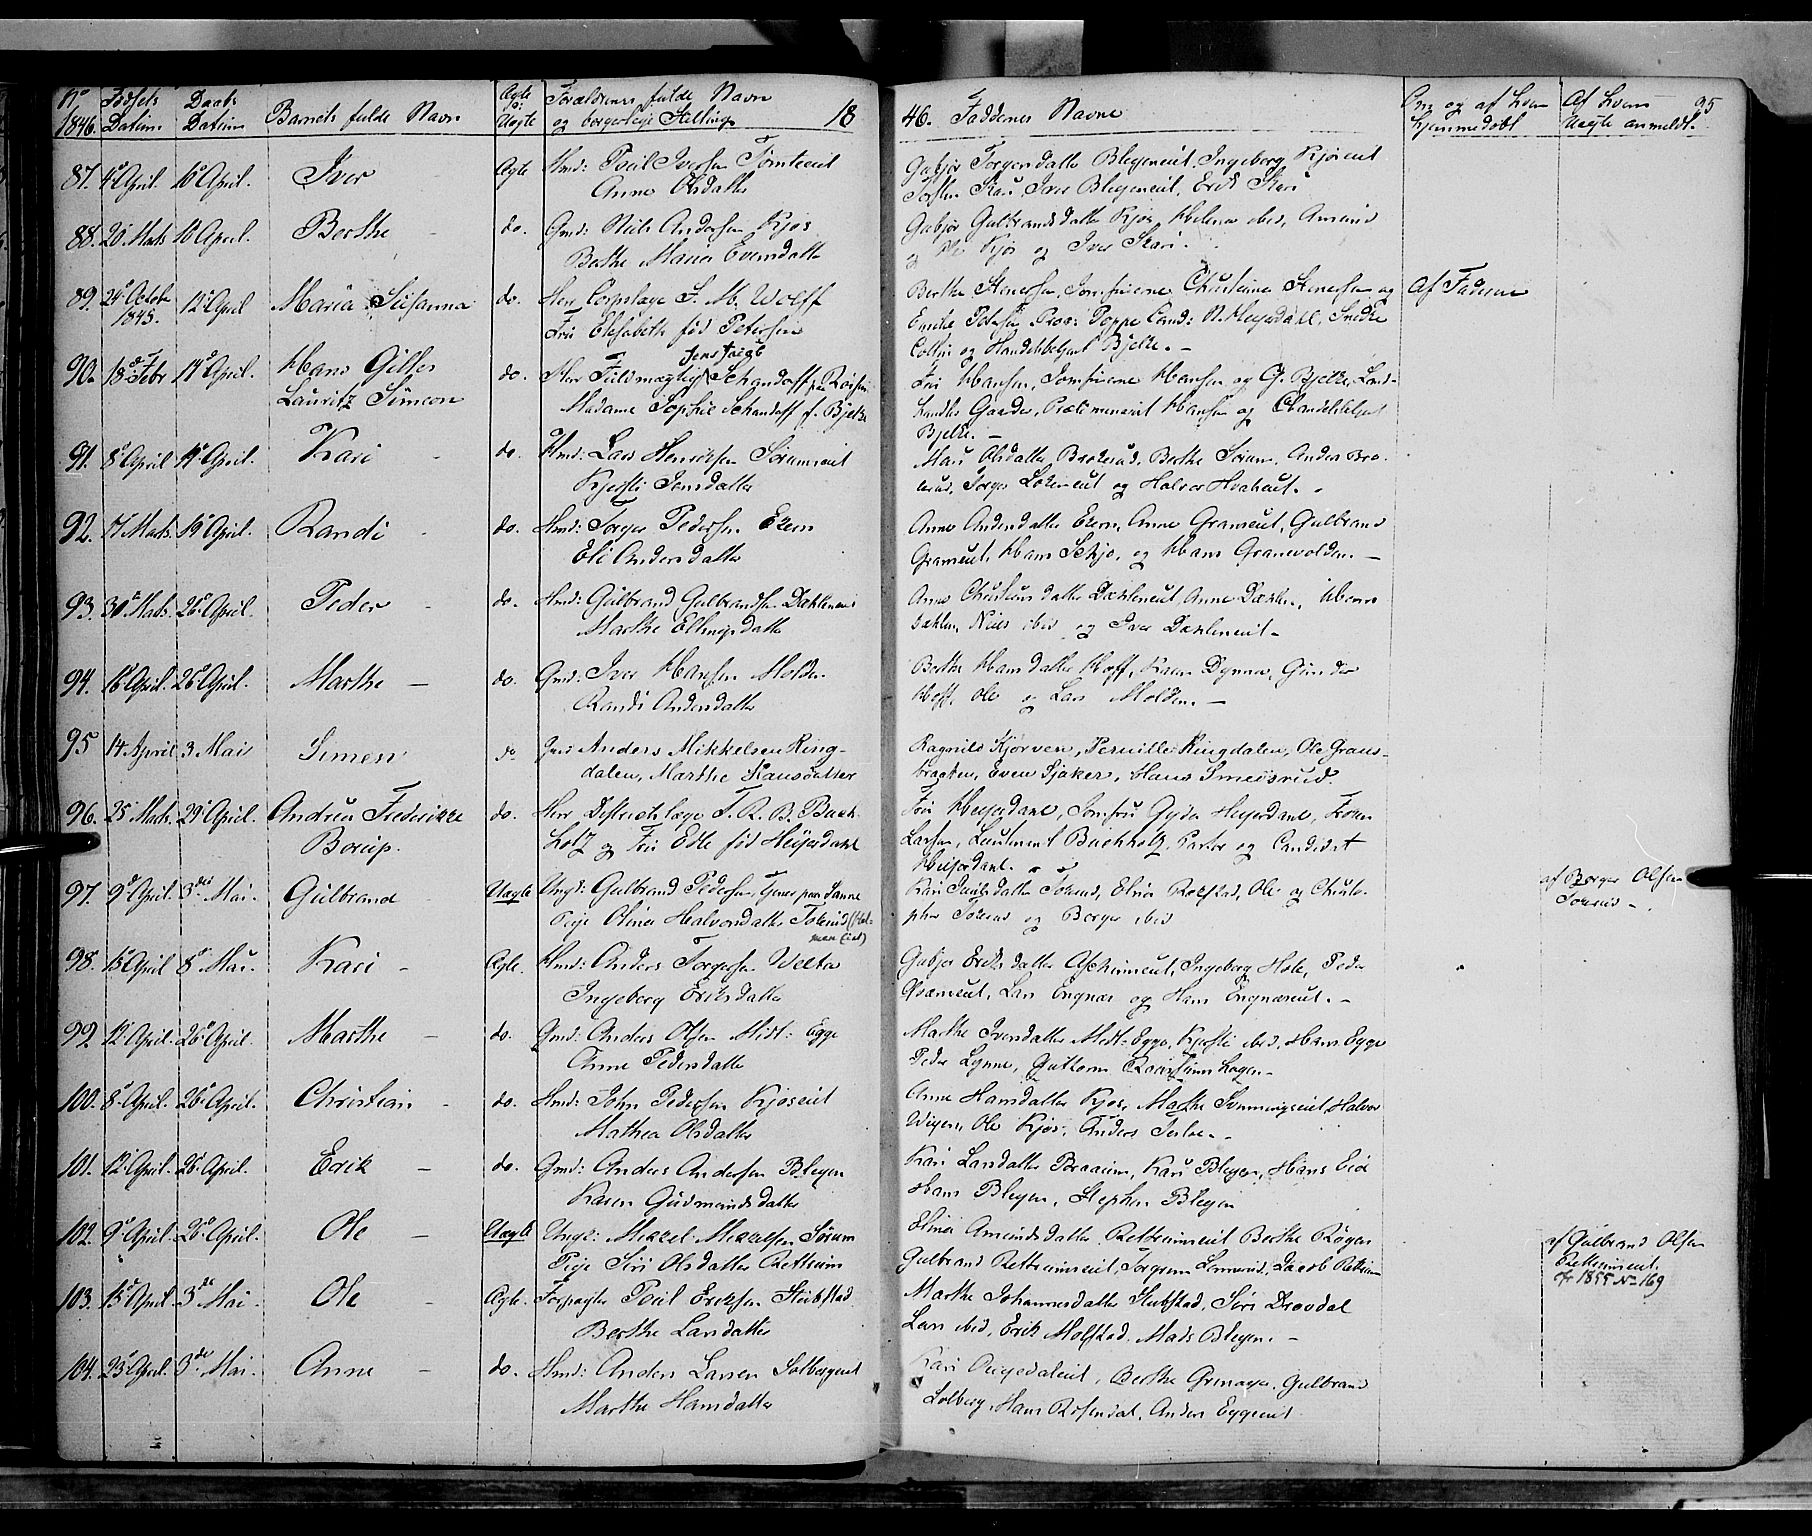 SAH, Gran prestekontor, Ministerialbok nr. 11, 1842-1856, s. 94-95